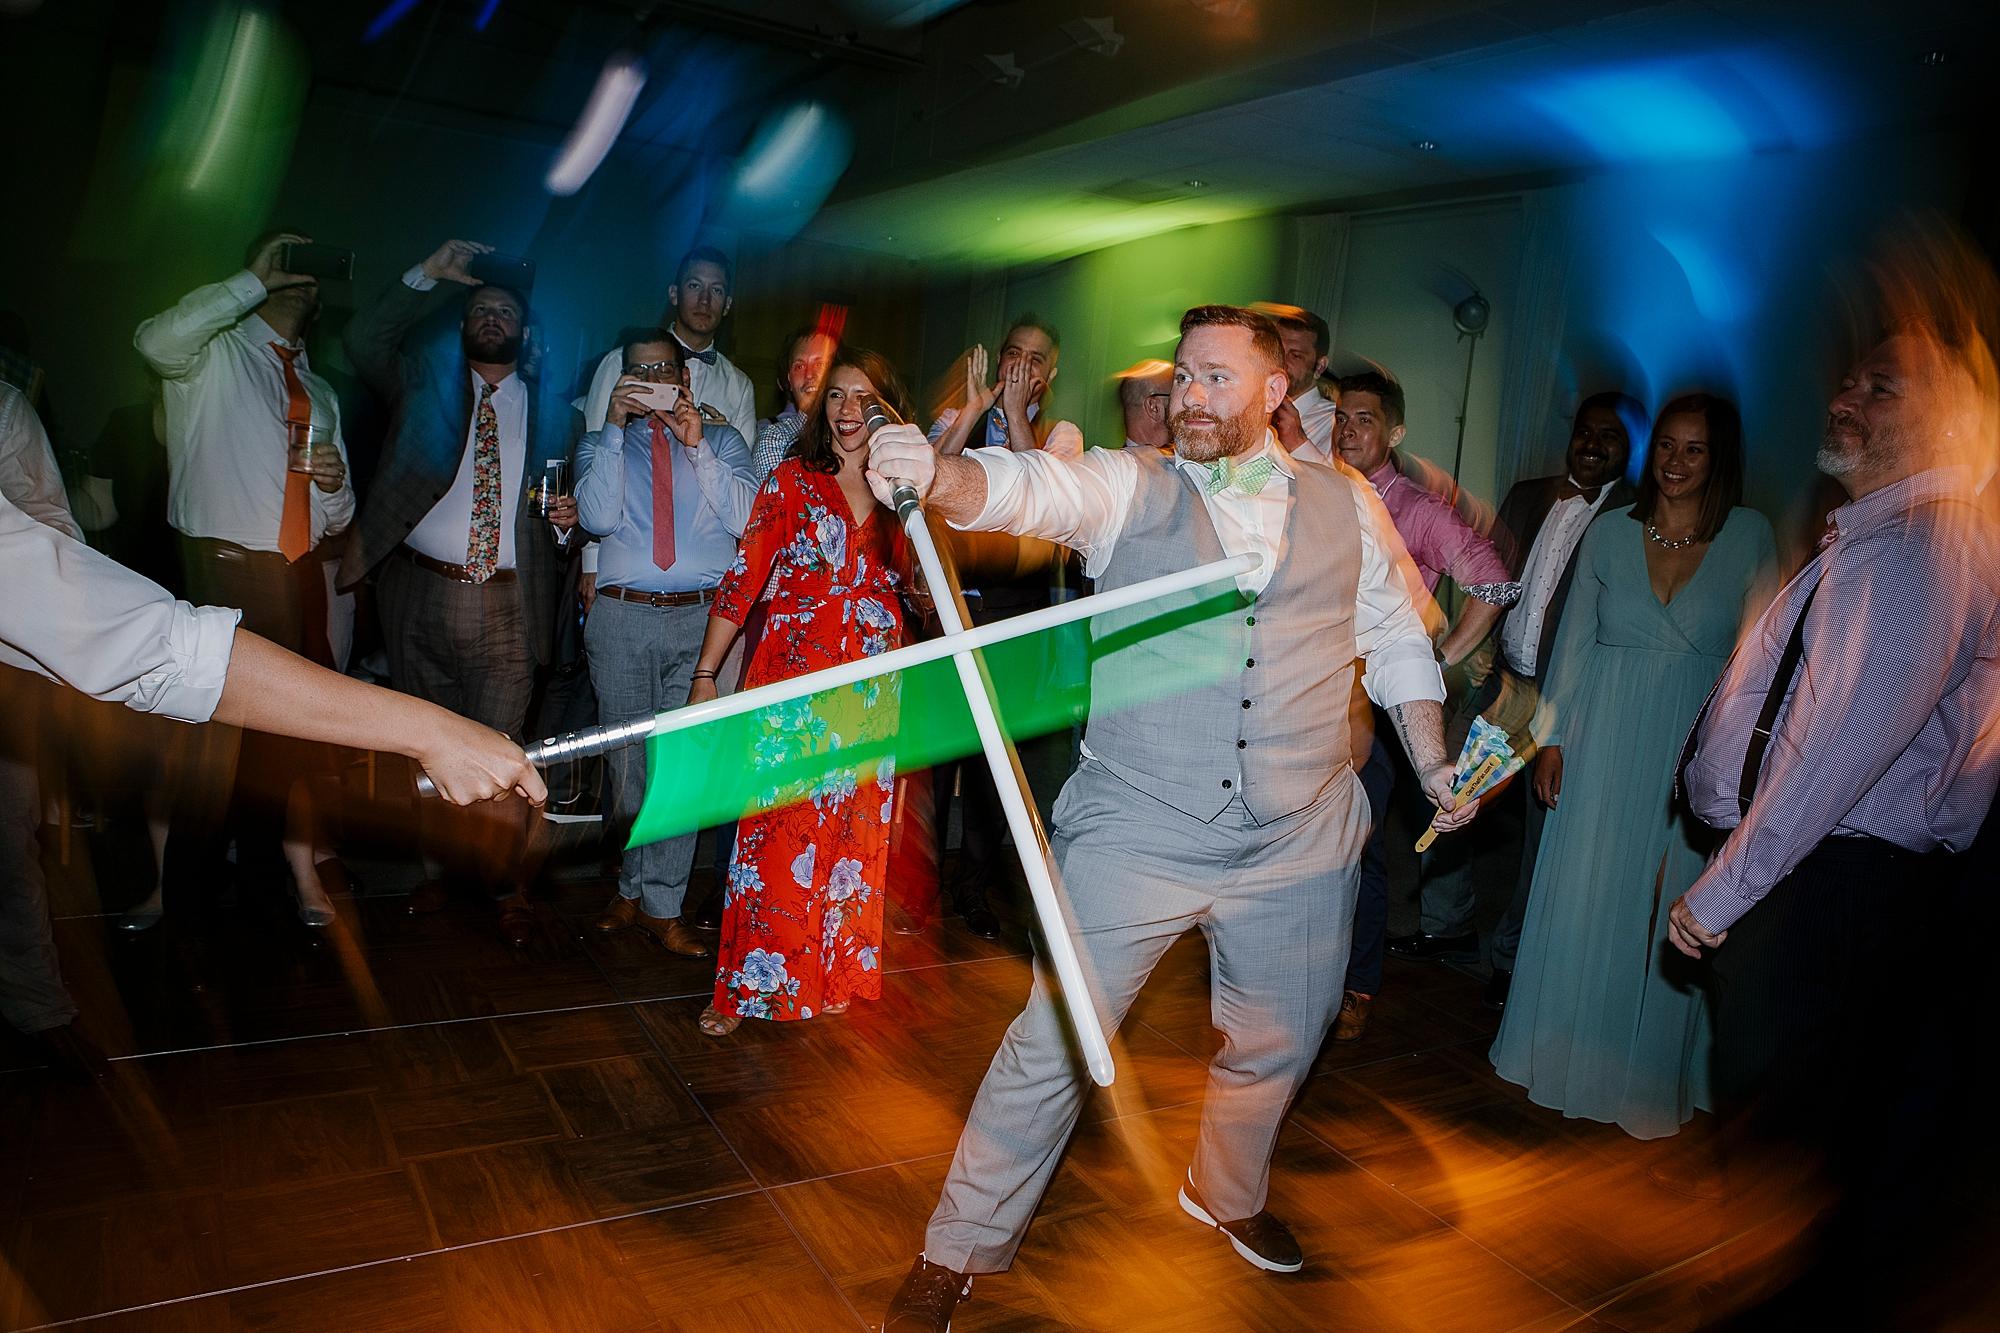 Dan_and_Byron_Love_by_Joe_Mac_Philadelphia_Wedding_LGBTQ_Photography_Gay_Independence_visitor_Center_145.JPG